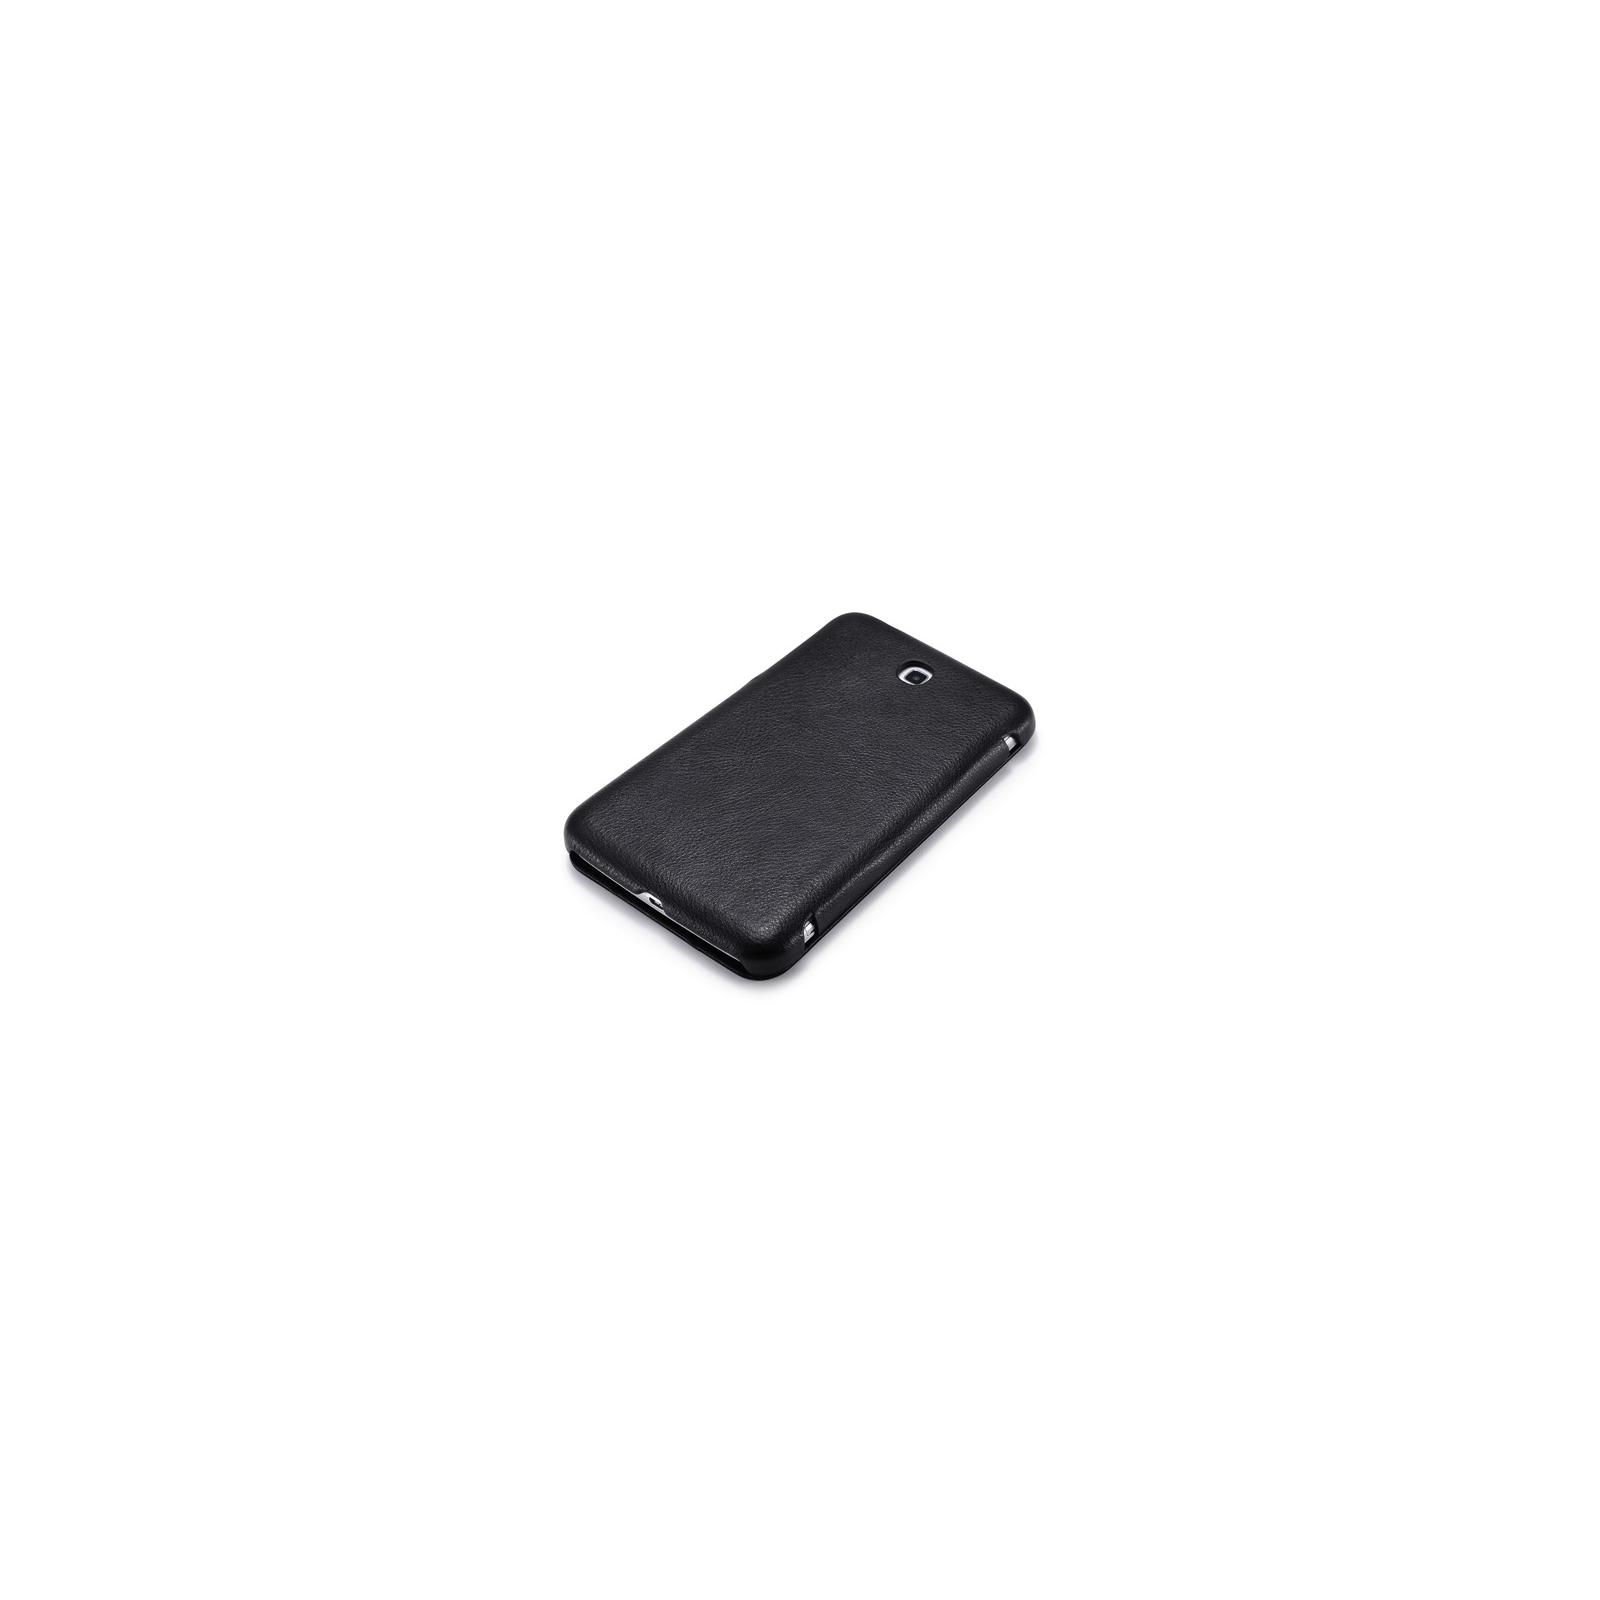 "Чехол для планшета i-Carer 7"" Samsung Galaxy Tab 3 7.0 T2100/P3200 шкіряний (RS320001 Black) изображение 3"